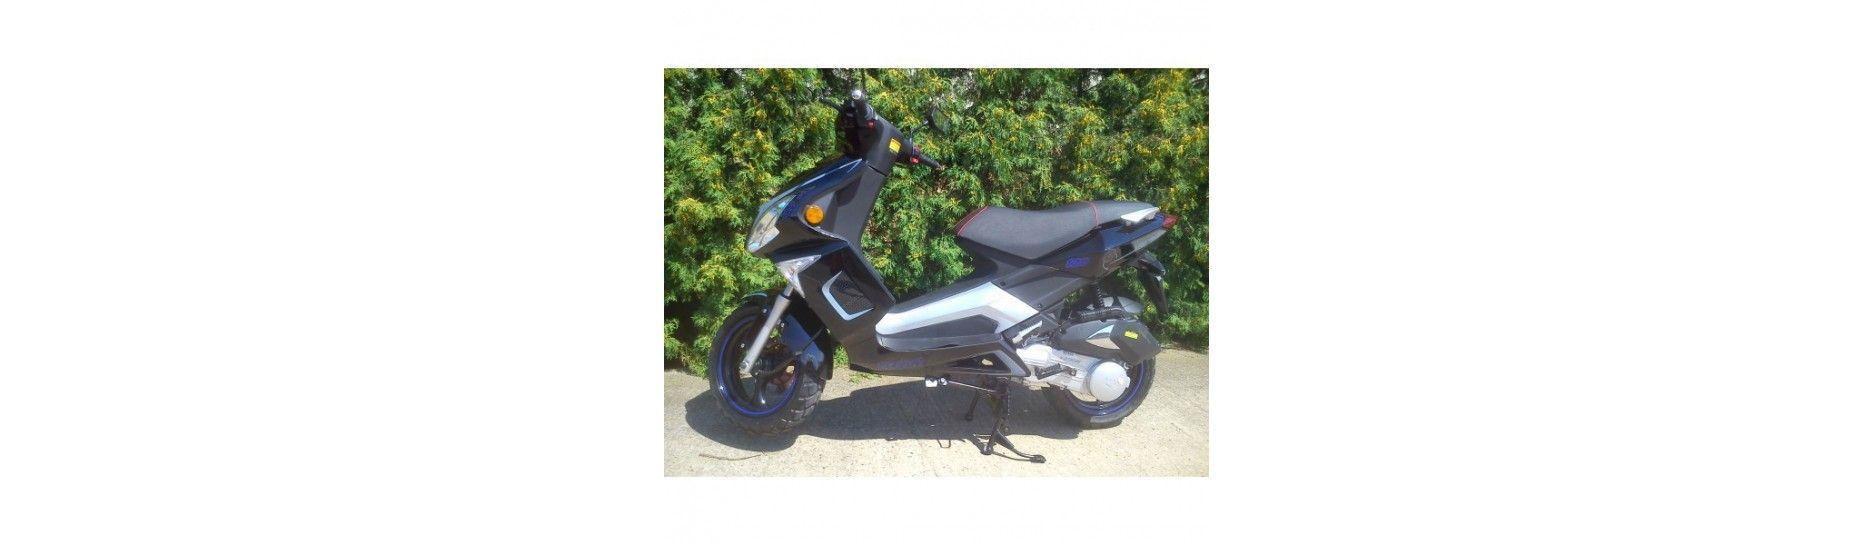 Star 125cc